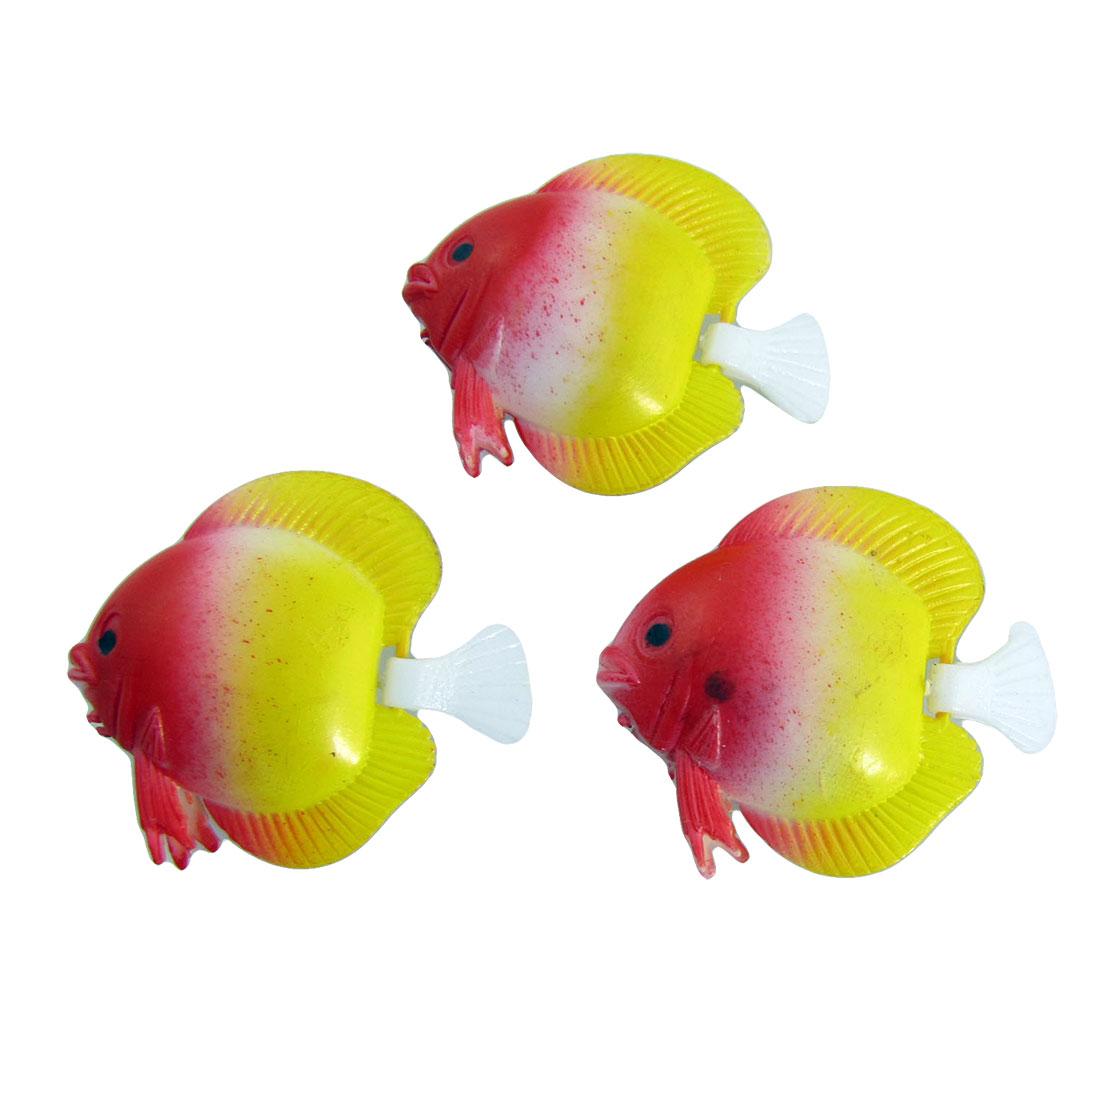 Aquarium Yellow Red Wiggle Tail Mini Fish Decoration 3Pcs